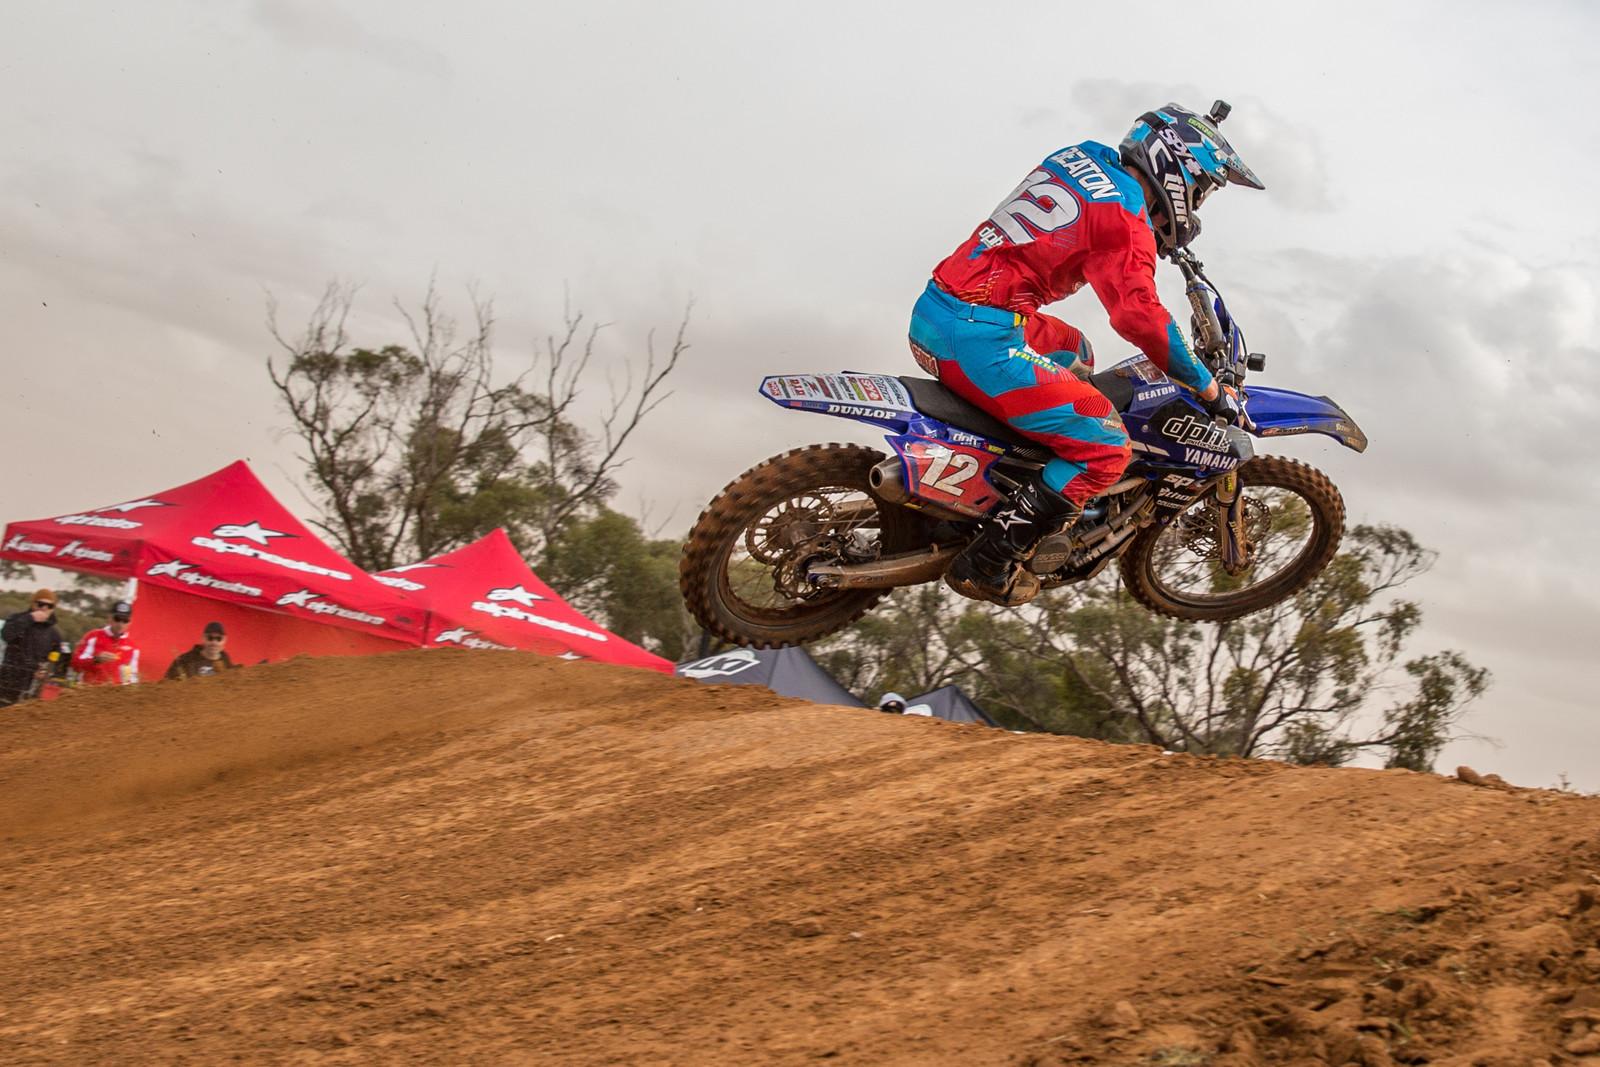 Jed Beaton - Australian Motul Mx Championships: Round 4, Murray Bridge - Motocross Pictures - Vital MX